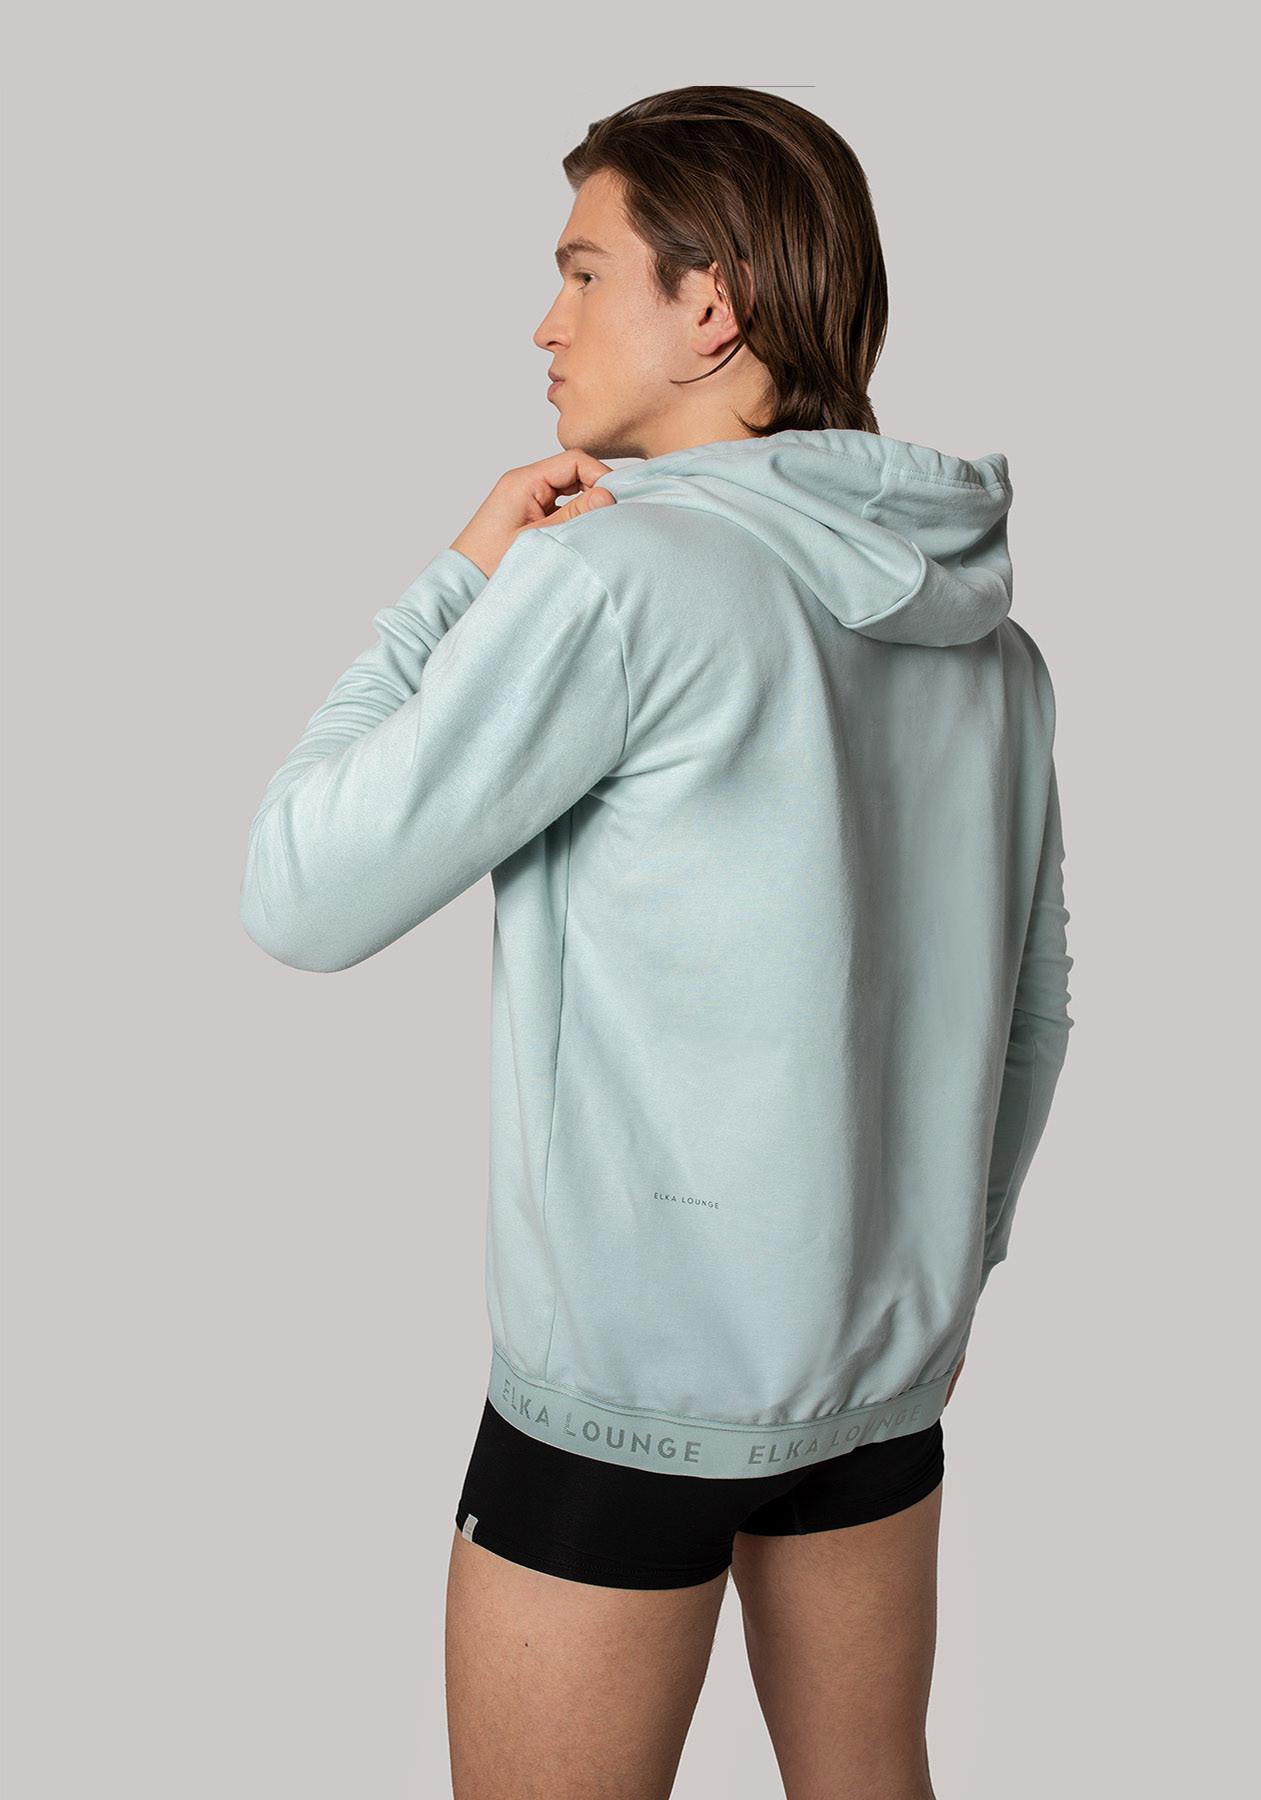 Men-Sweatshirt-ELKA-Lounge-M00572-1